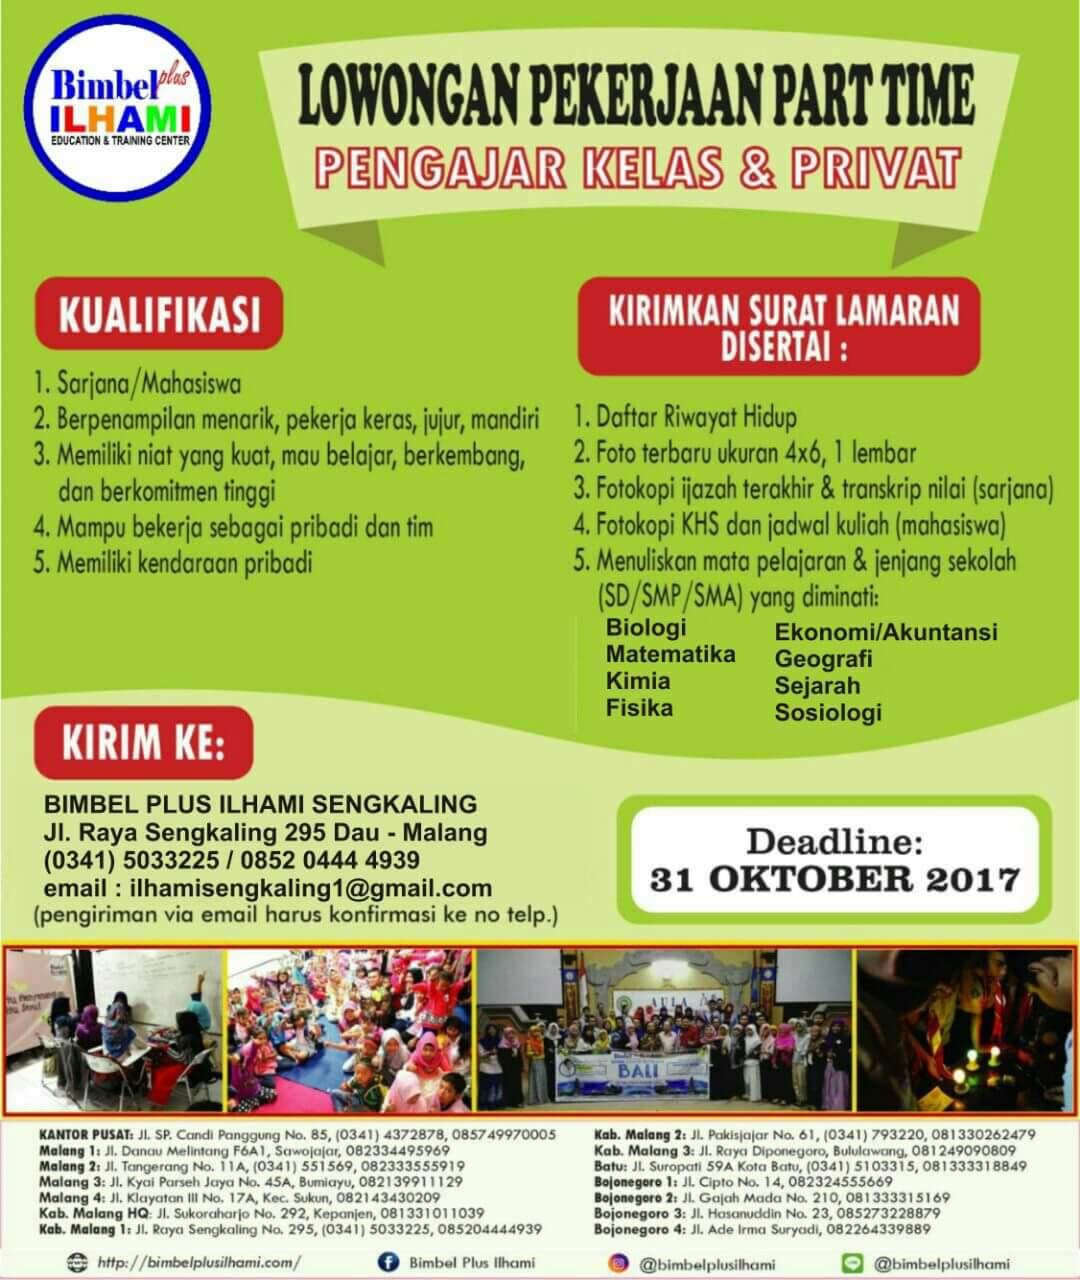 Lowongan Pekerjaan Part Time Malang Terbaru 2017 Longan Malang